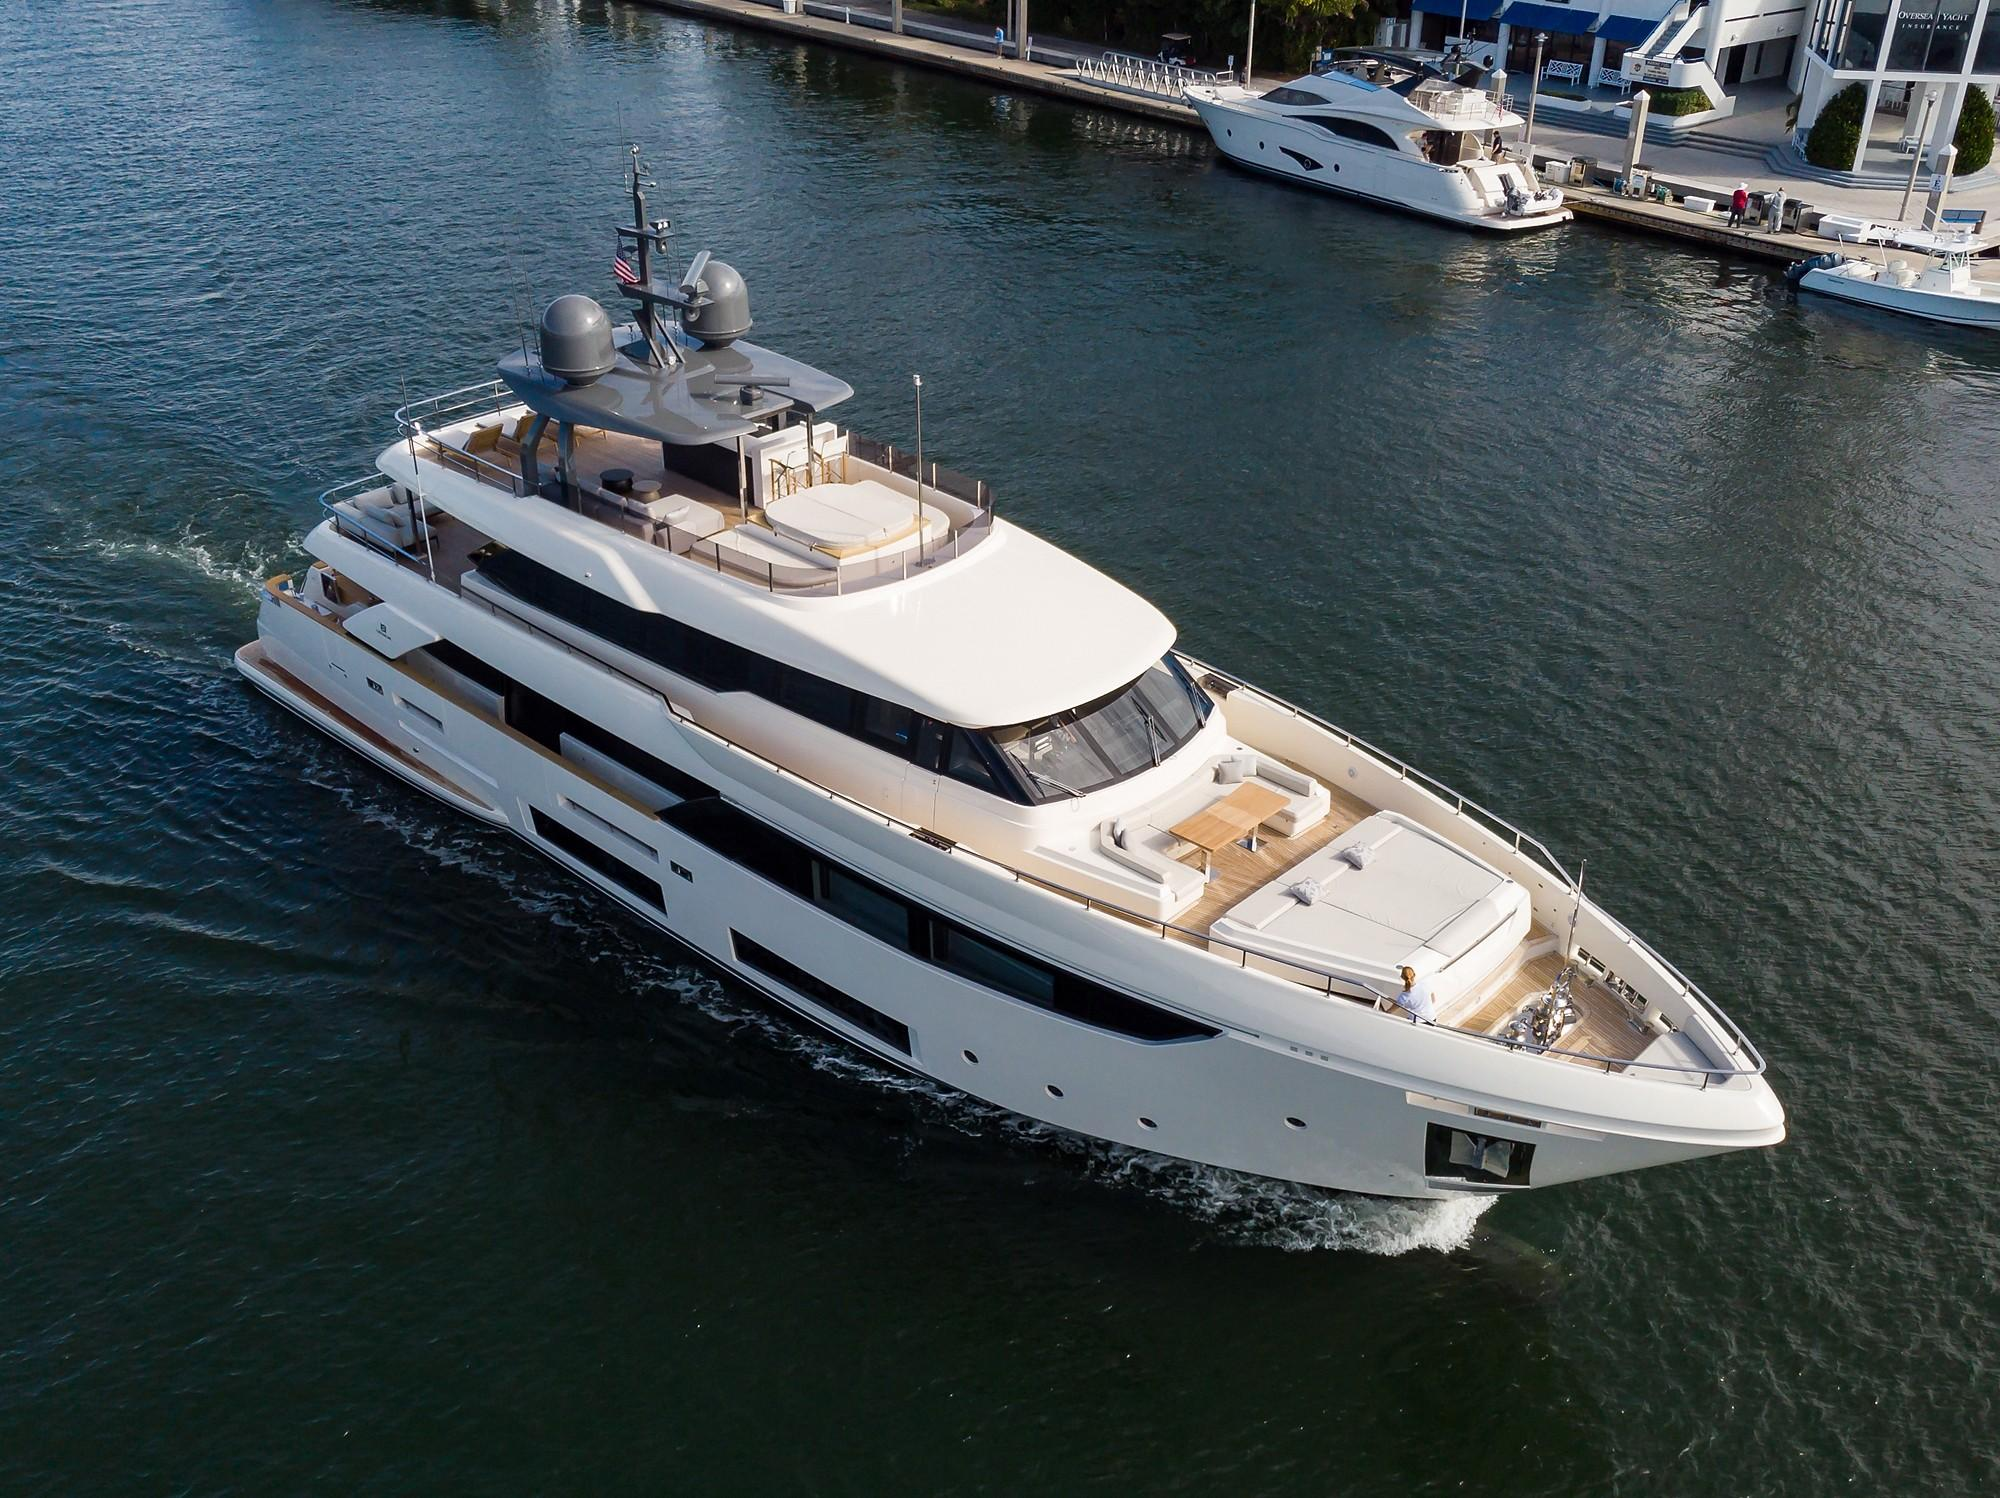 2018 Custom Line Navetta 33 M - Ariel Profile